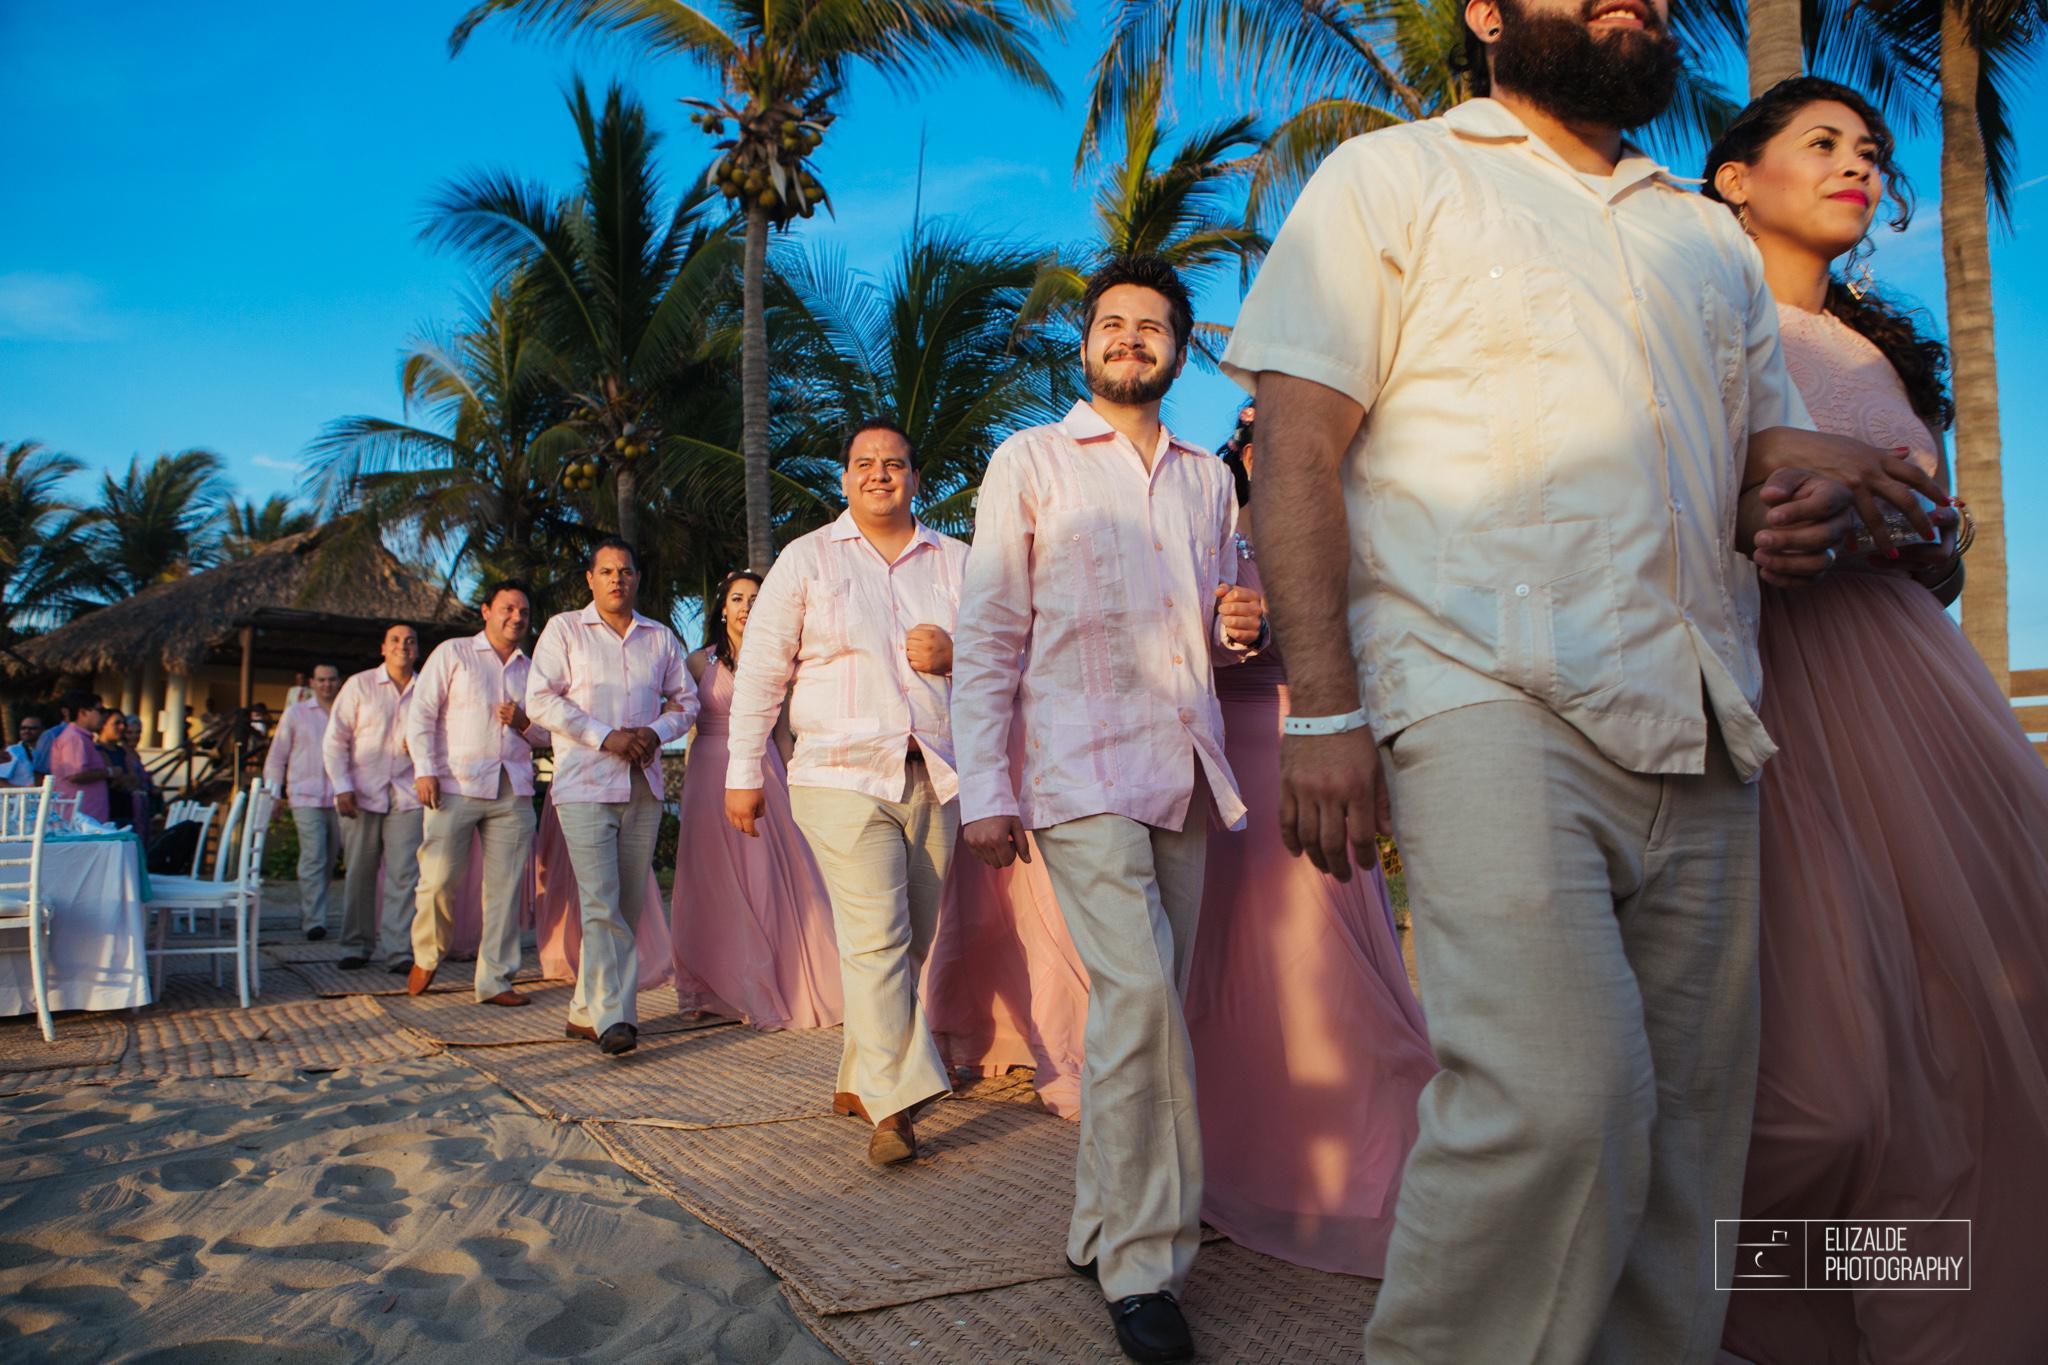 Pay and Ferran_Acapulco_Destination Wedding_Elizalde Photography-76.jpg